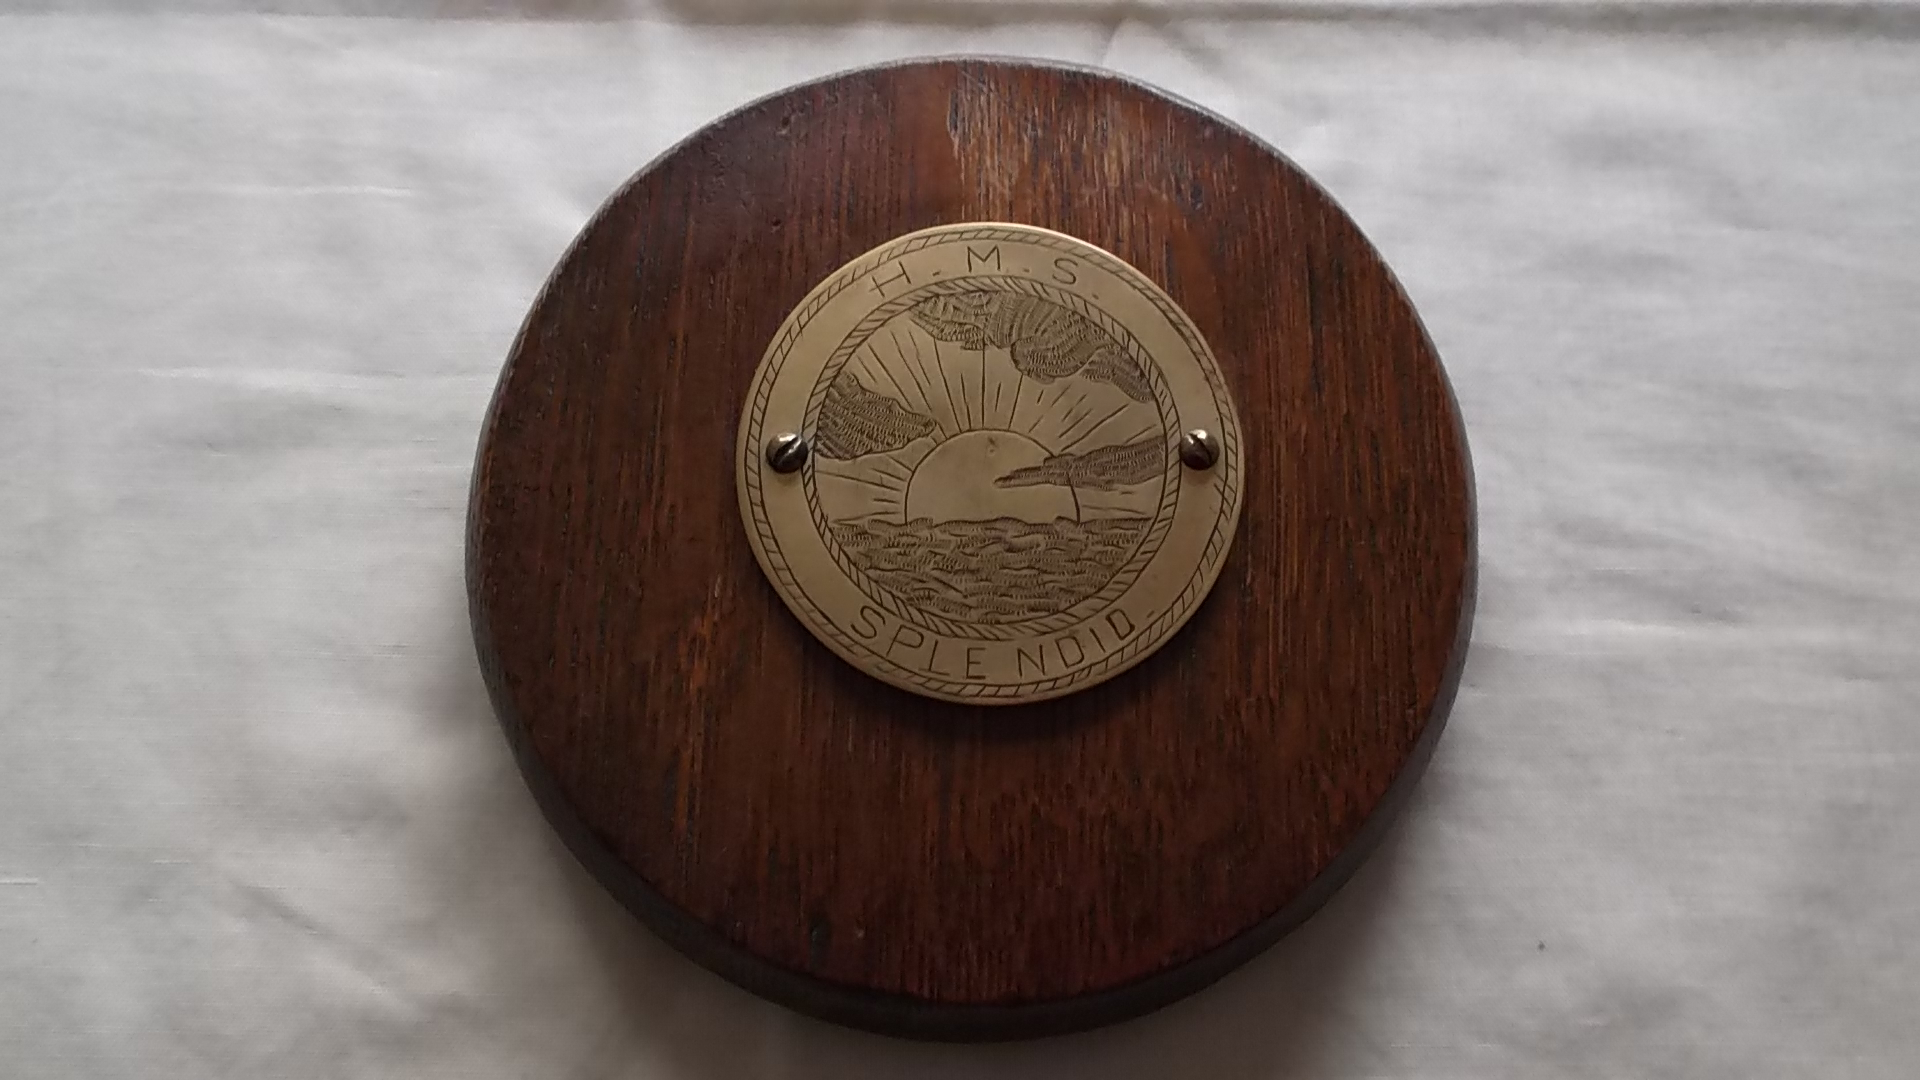 ROUND WOODEN PLAQUE SOUVENIR FROM HMS SPLENDID